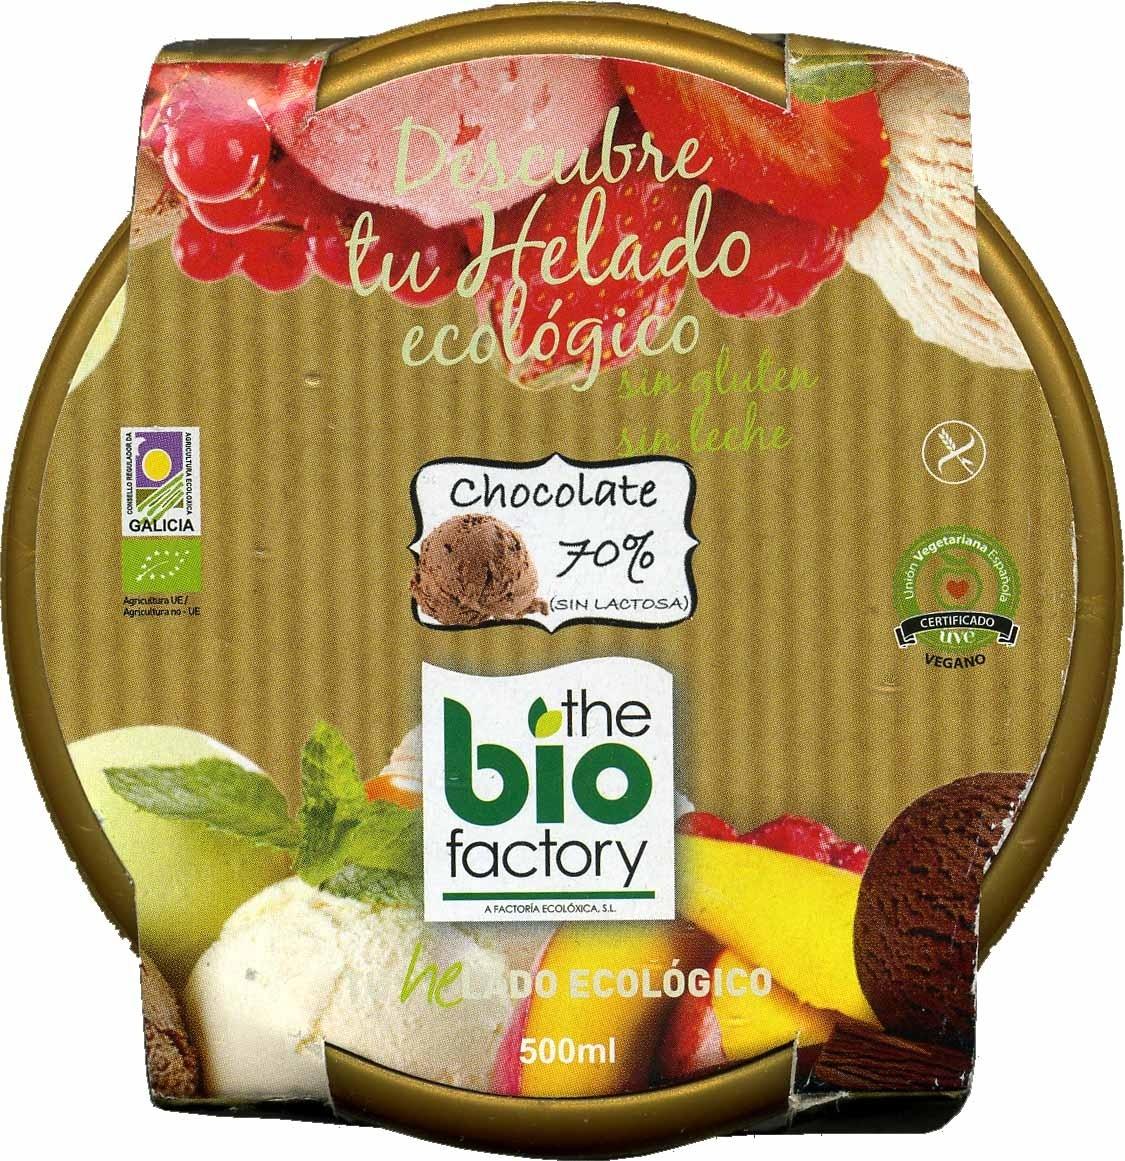 Helado chocolate 70% - Produit - es